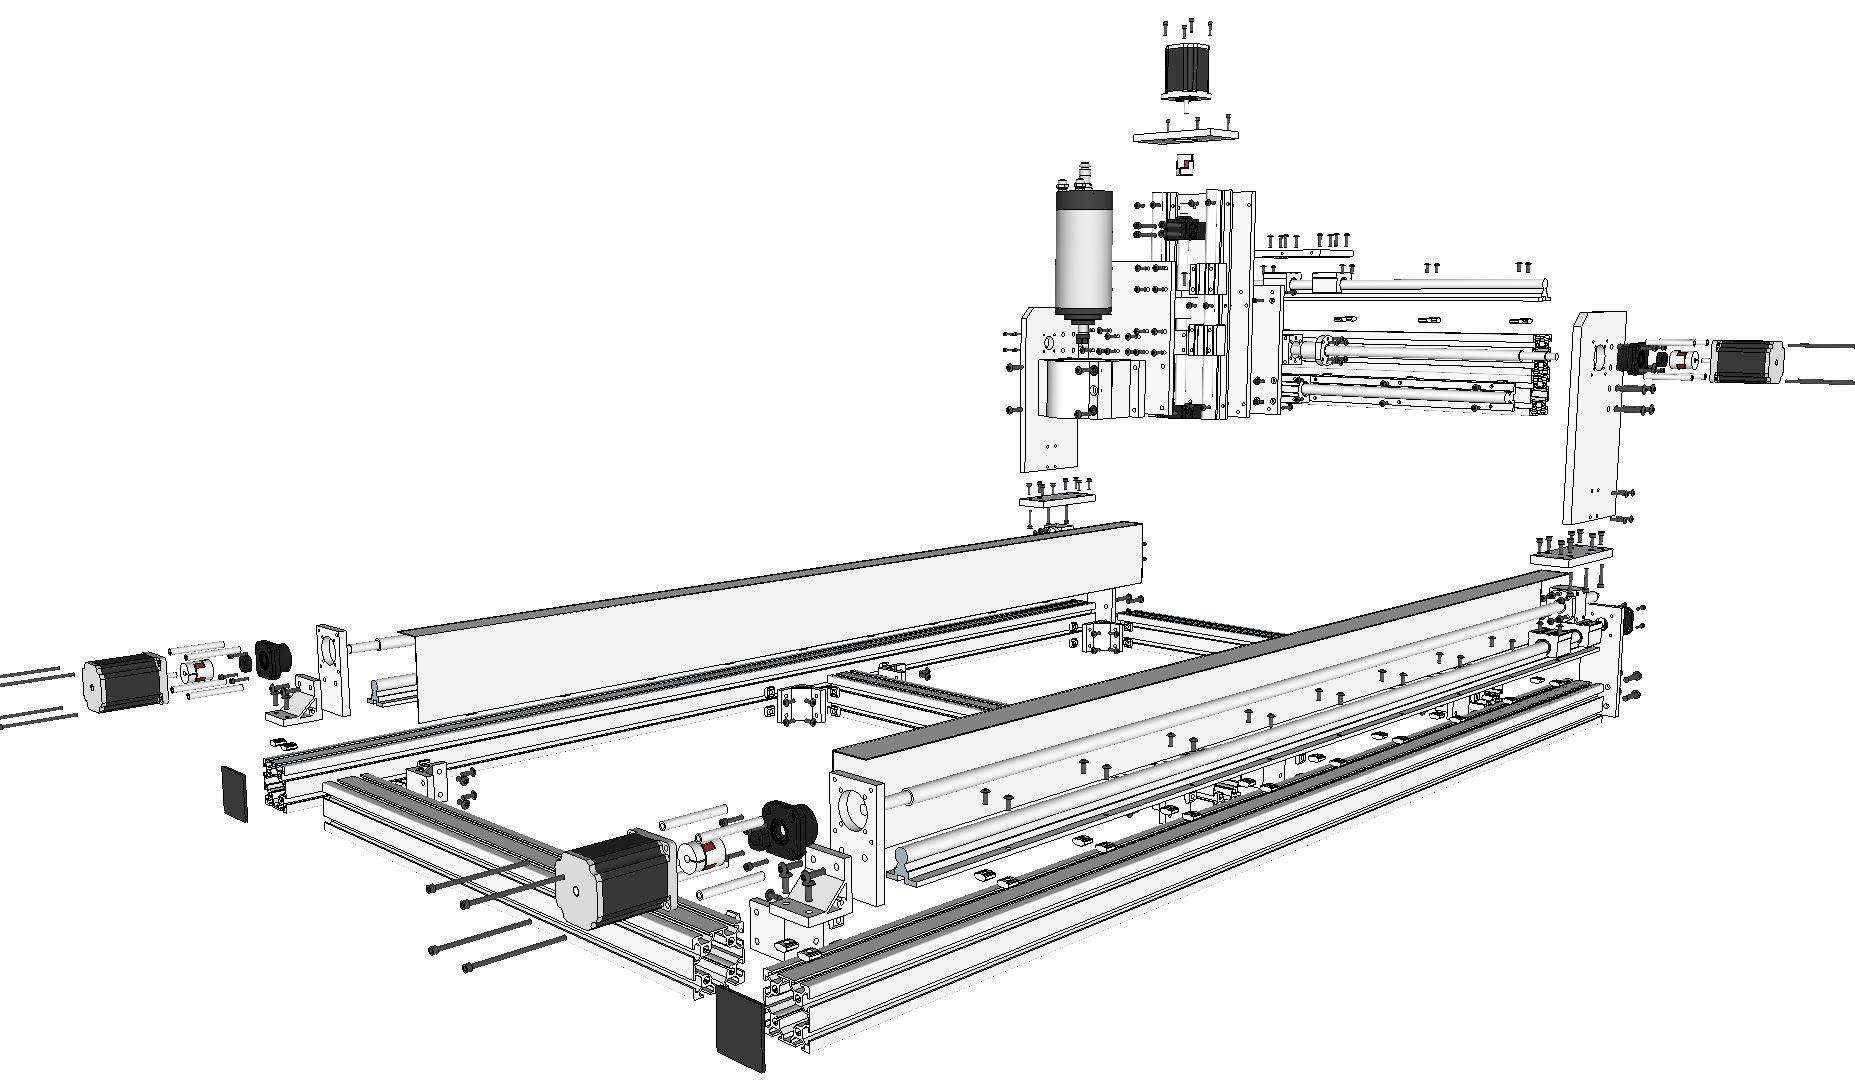 Id2cnc V 2 1 Machine Assembly Guide